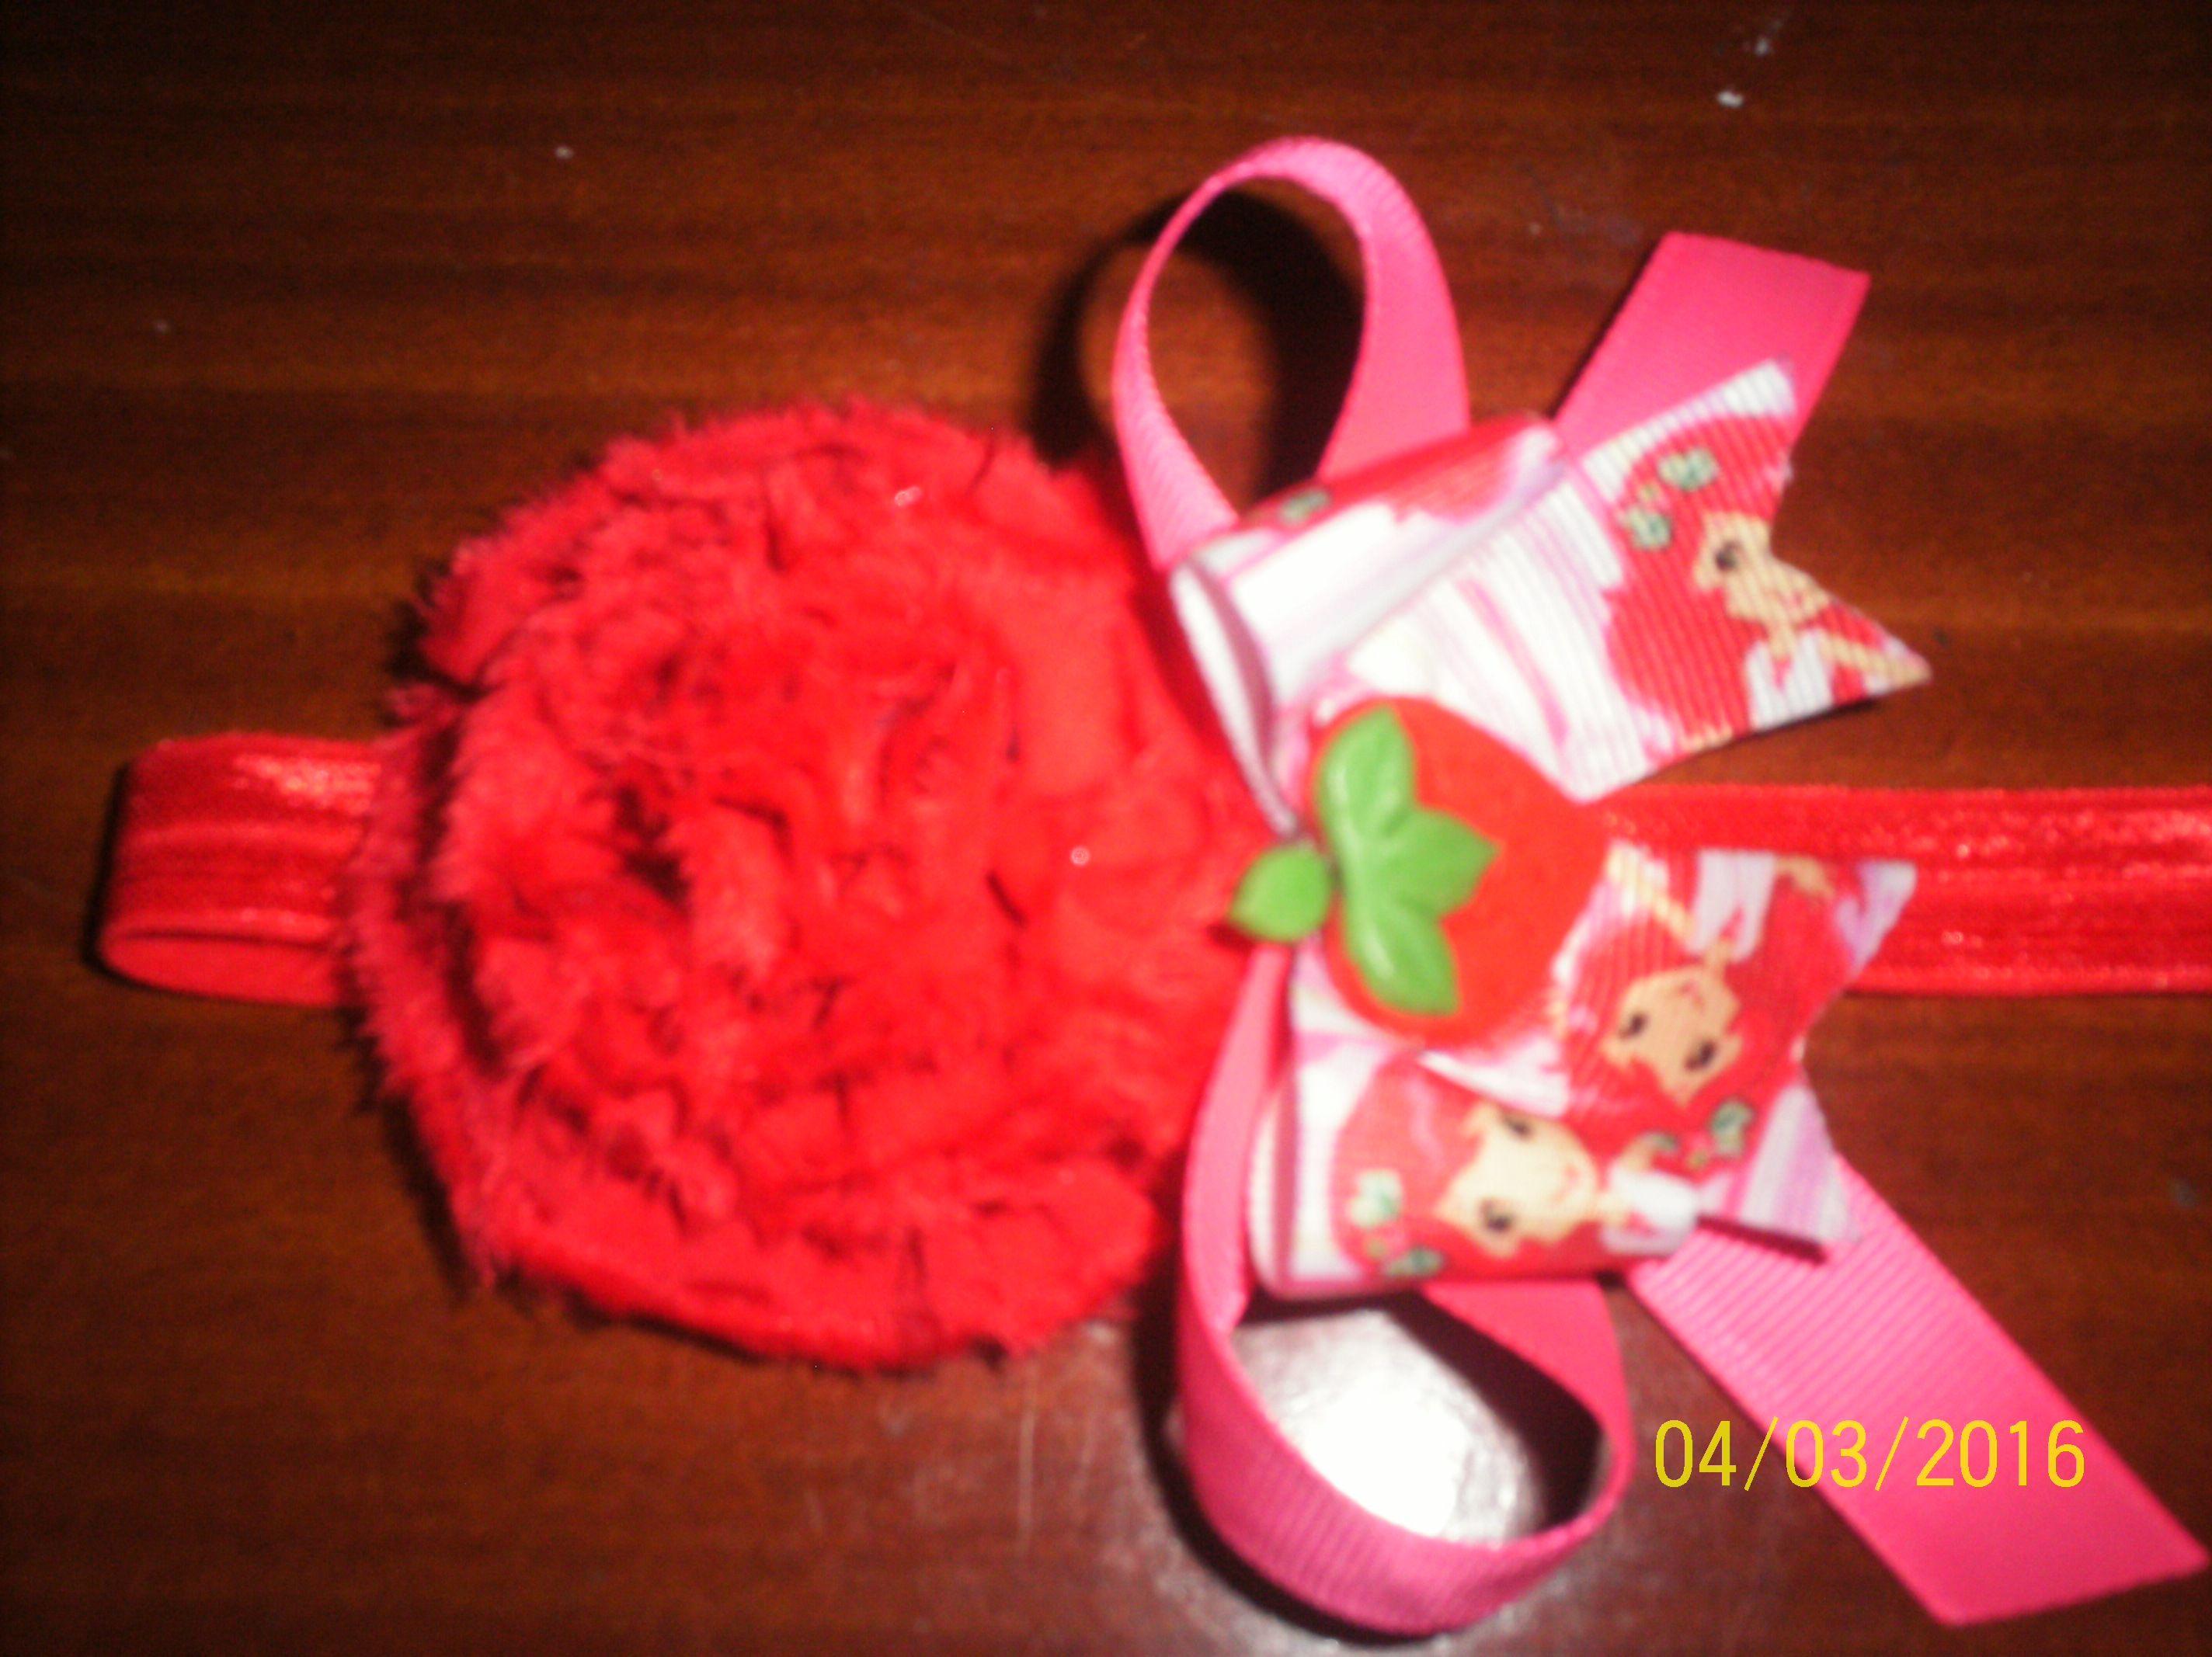 Blumenel Knüpfen diadema de rosita fresita diademas para niñas